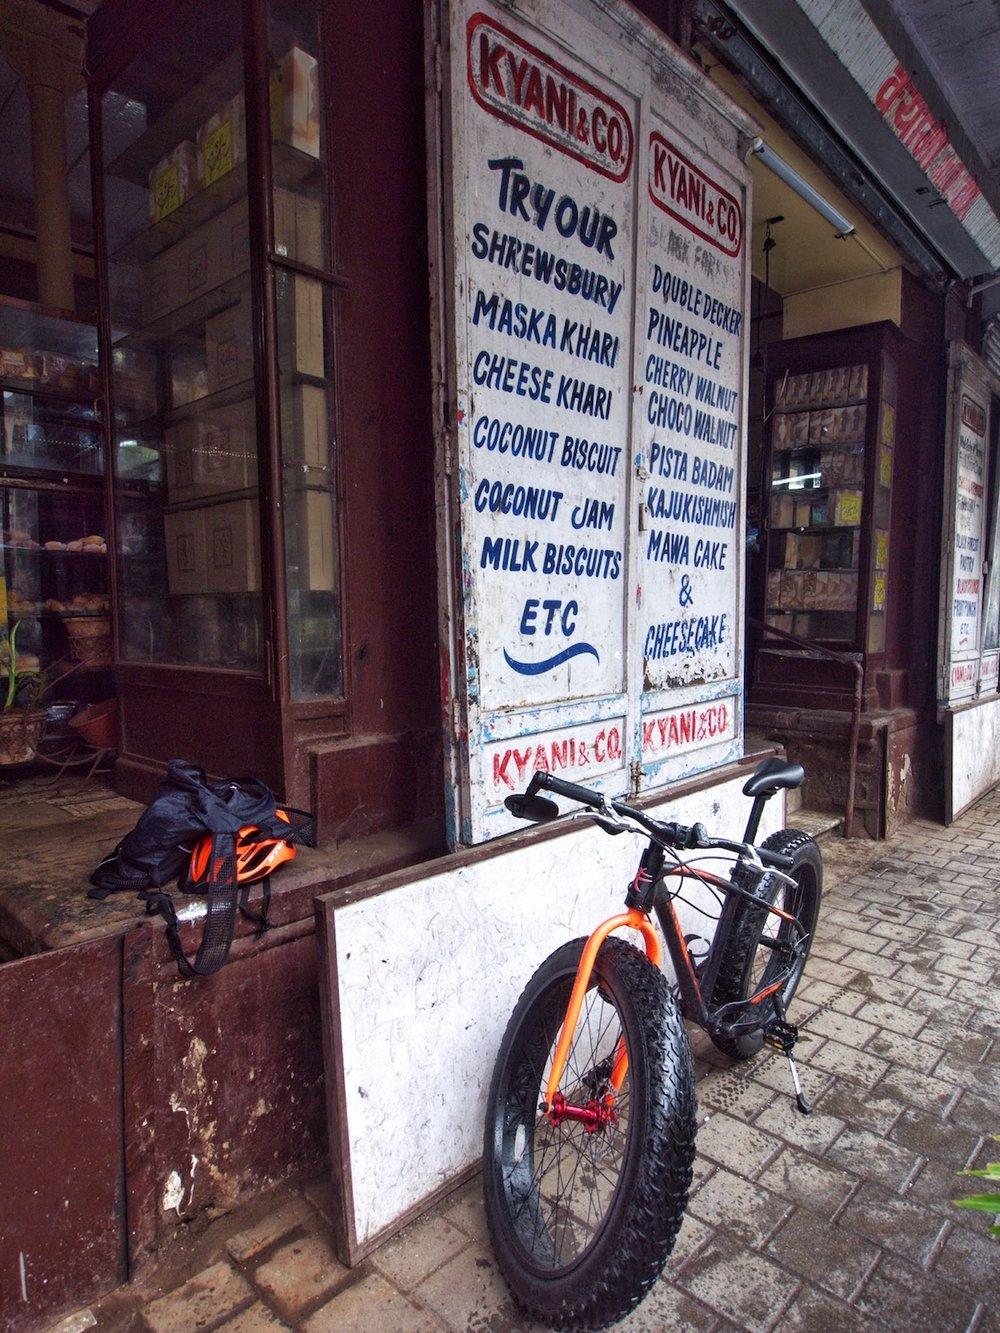 Kyani bakery on a bicycle  Mumbai.jpeg